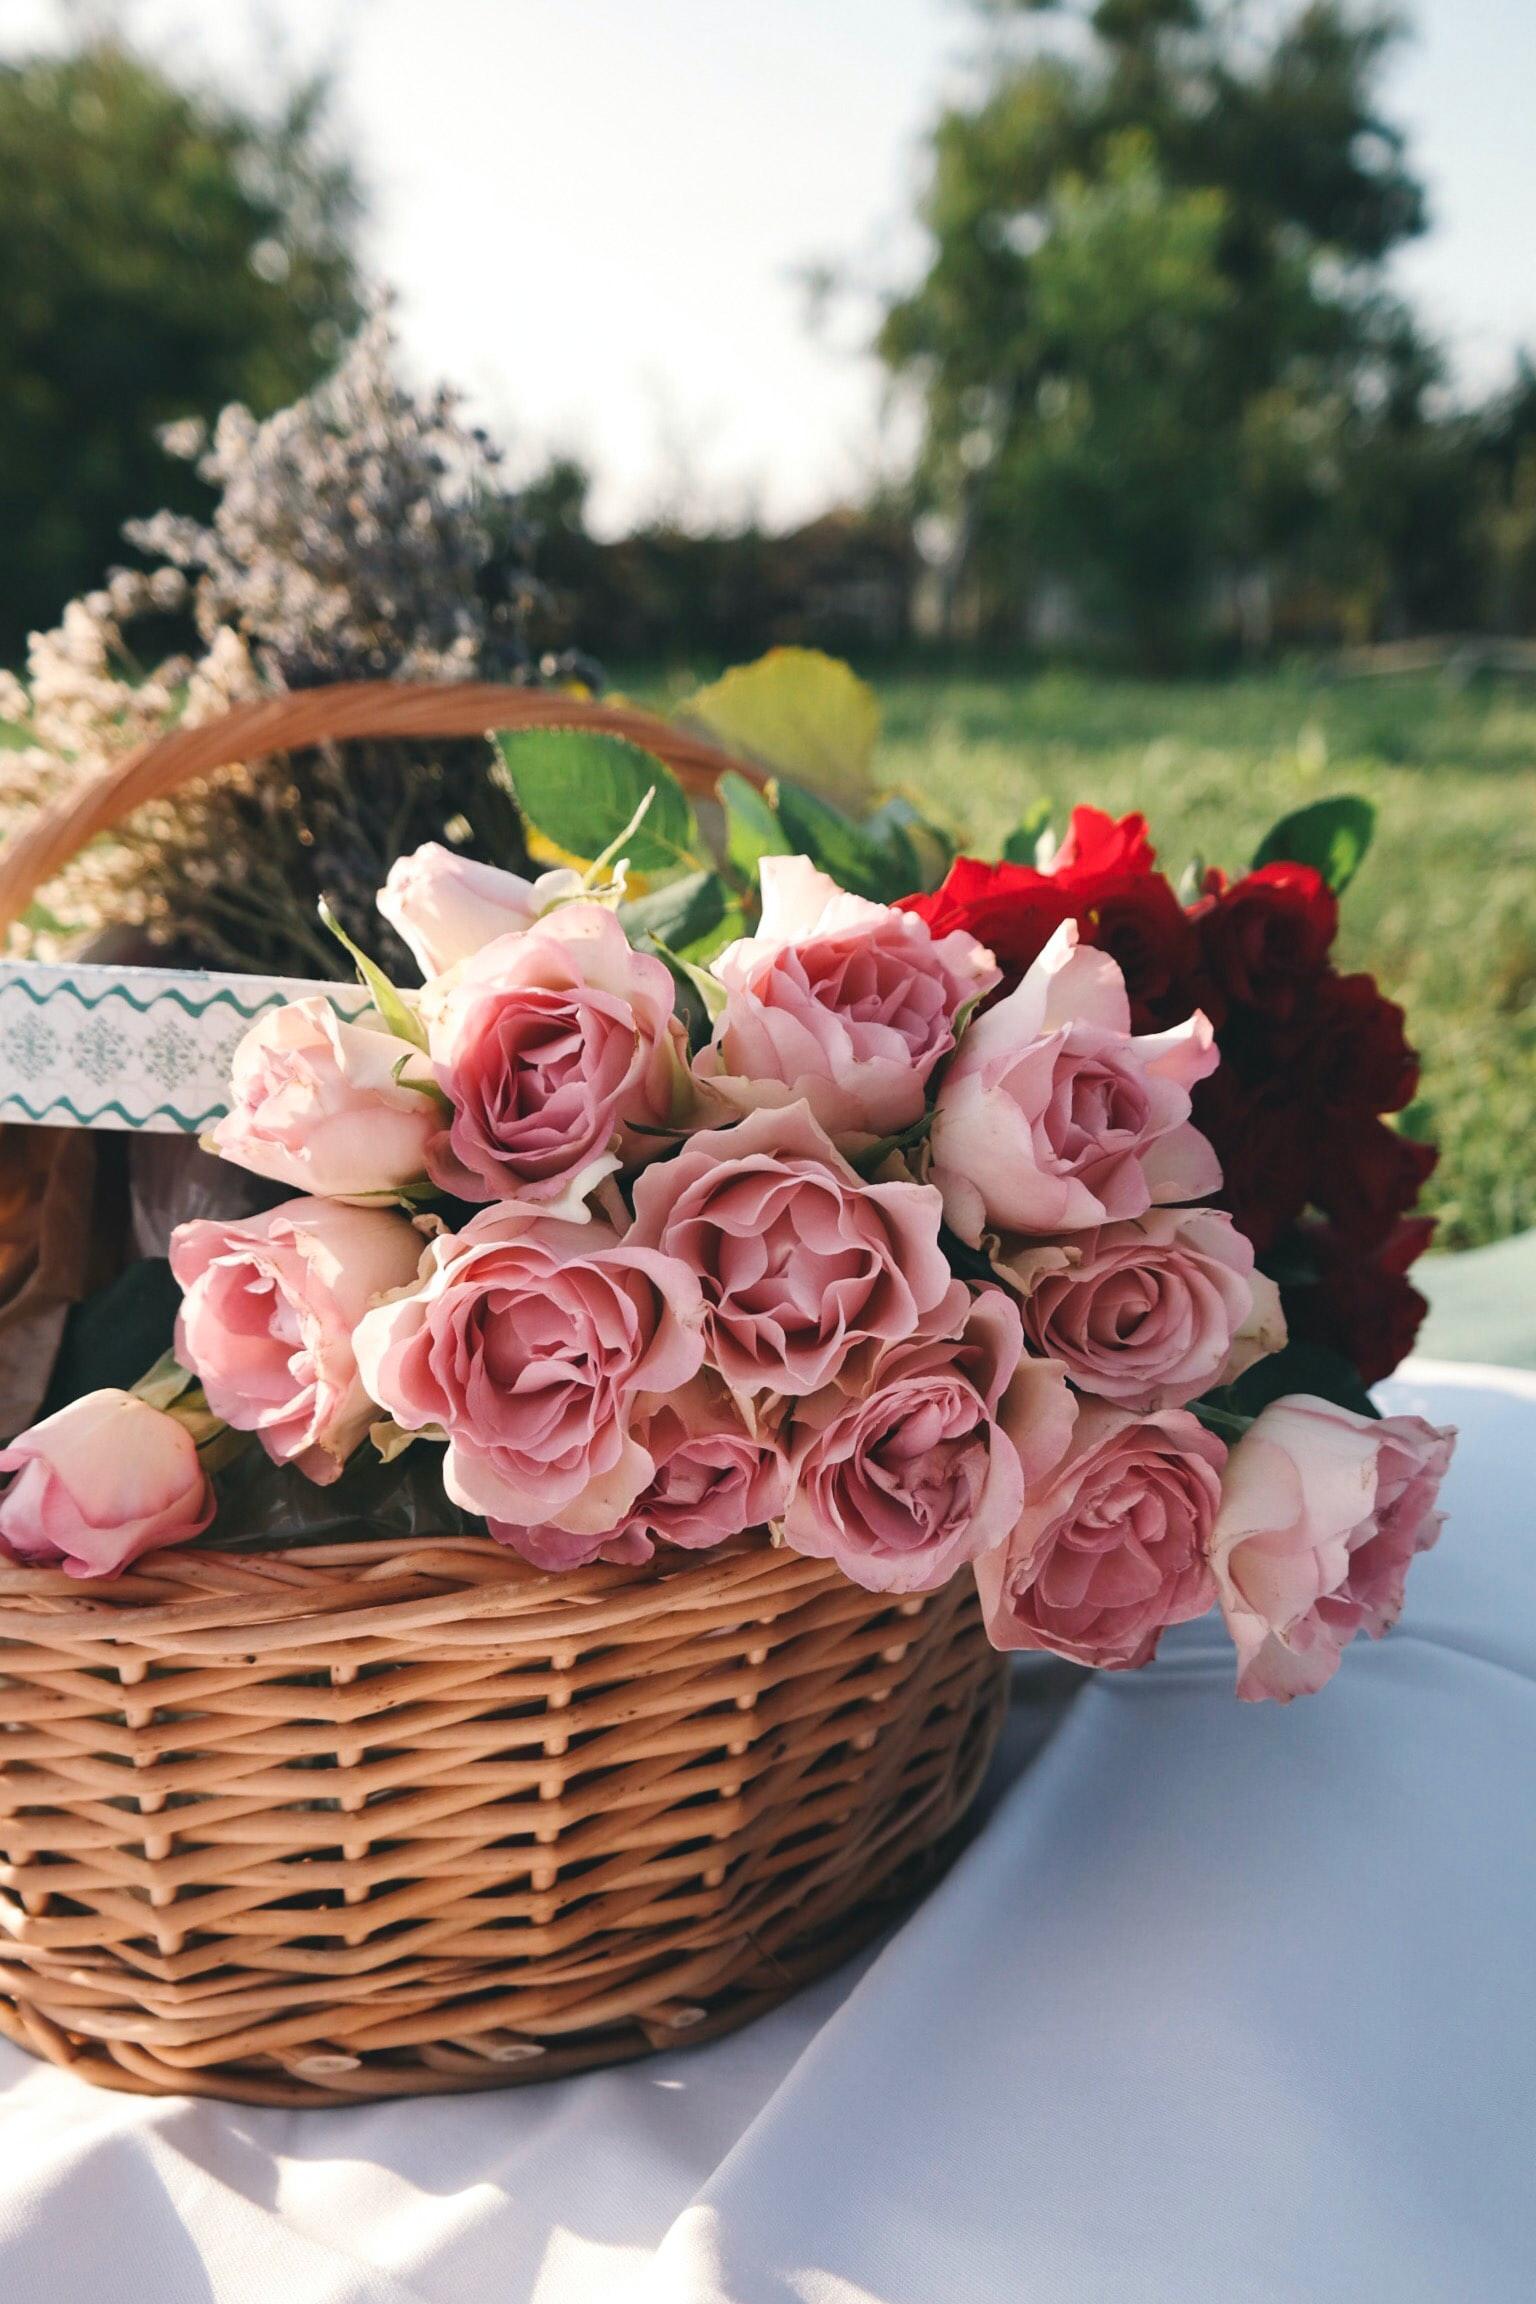 Benefits Of Applying Rose Water To Facial Skin